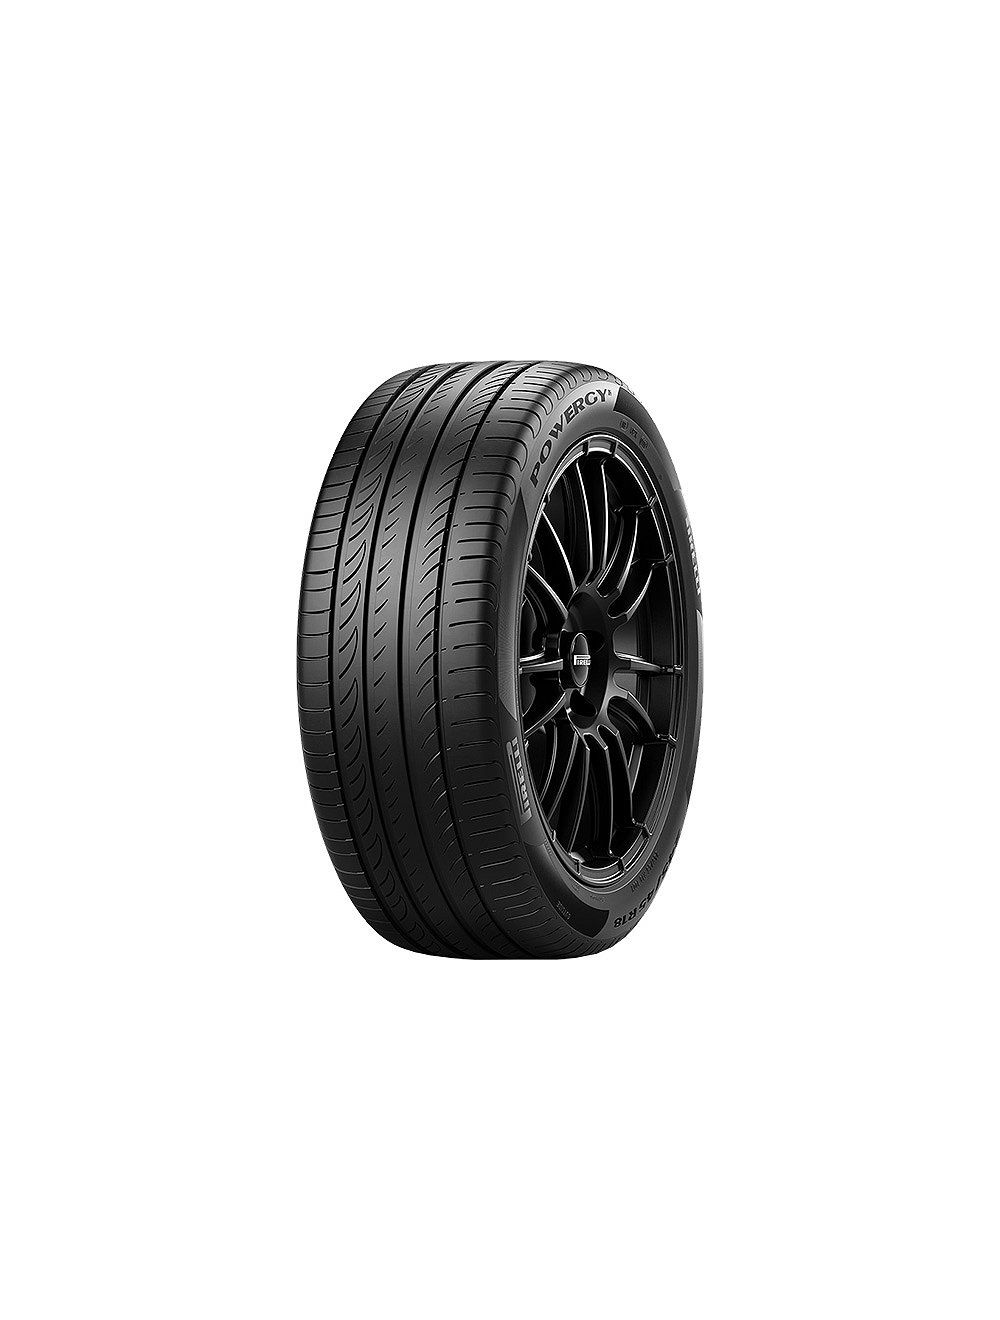 Pirelli 225/40R18 Y Powergy XL Nyári gumi